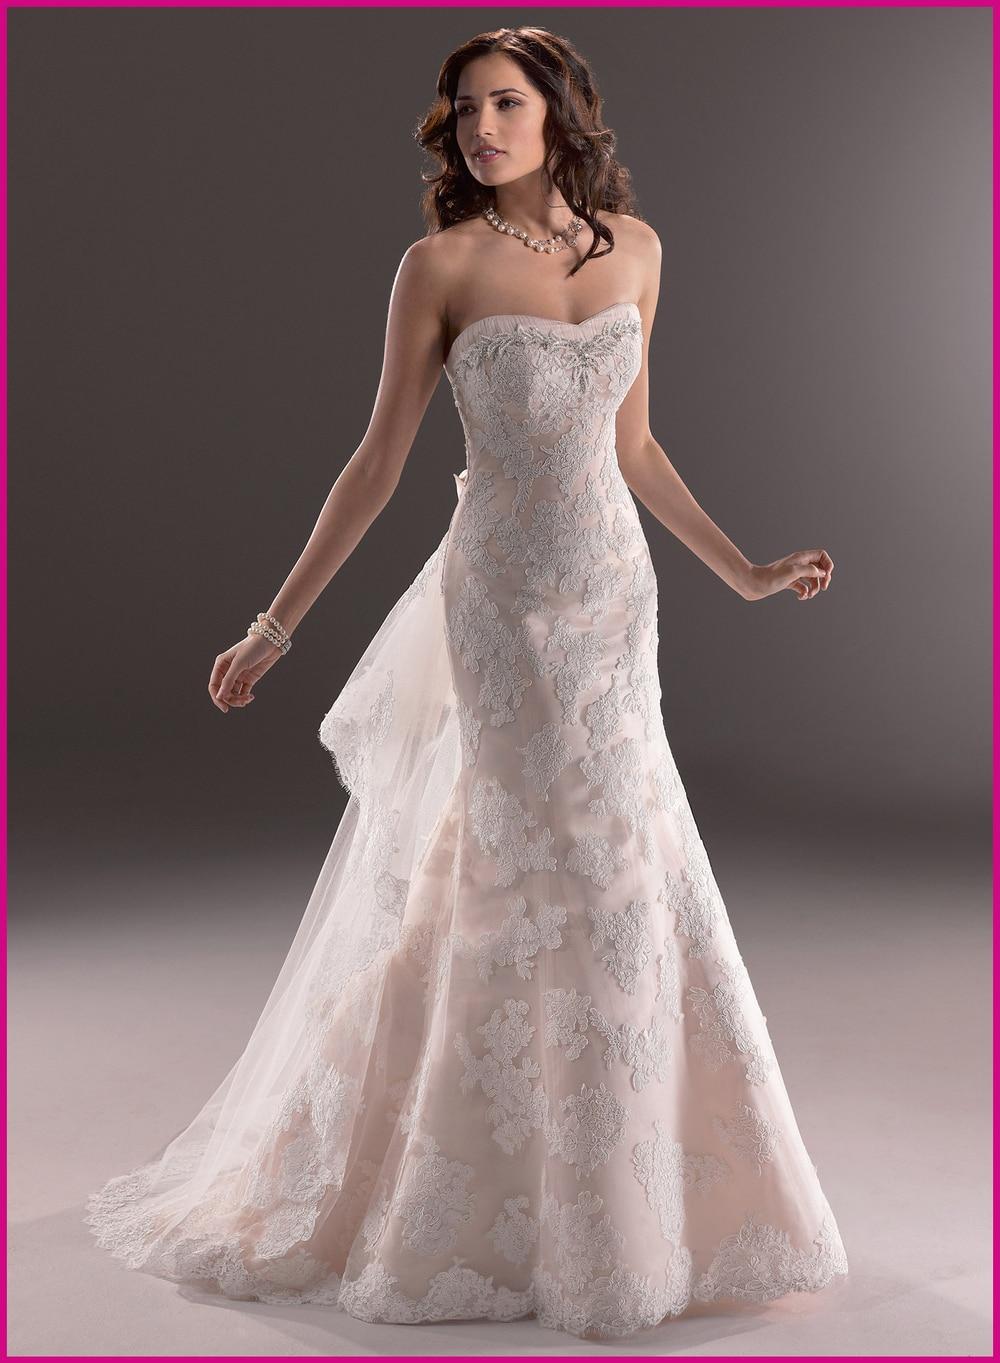 Popular Athena Wedding Dresses Buy Cheap Athena Wedding